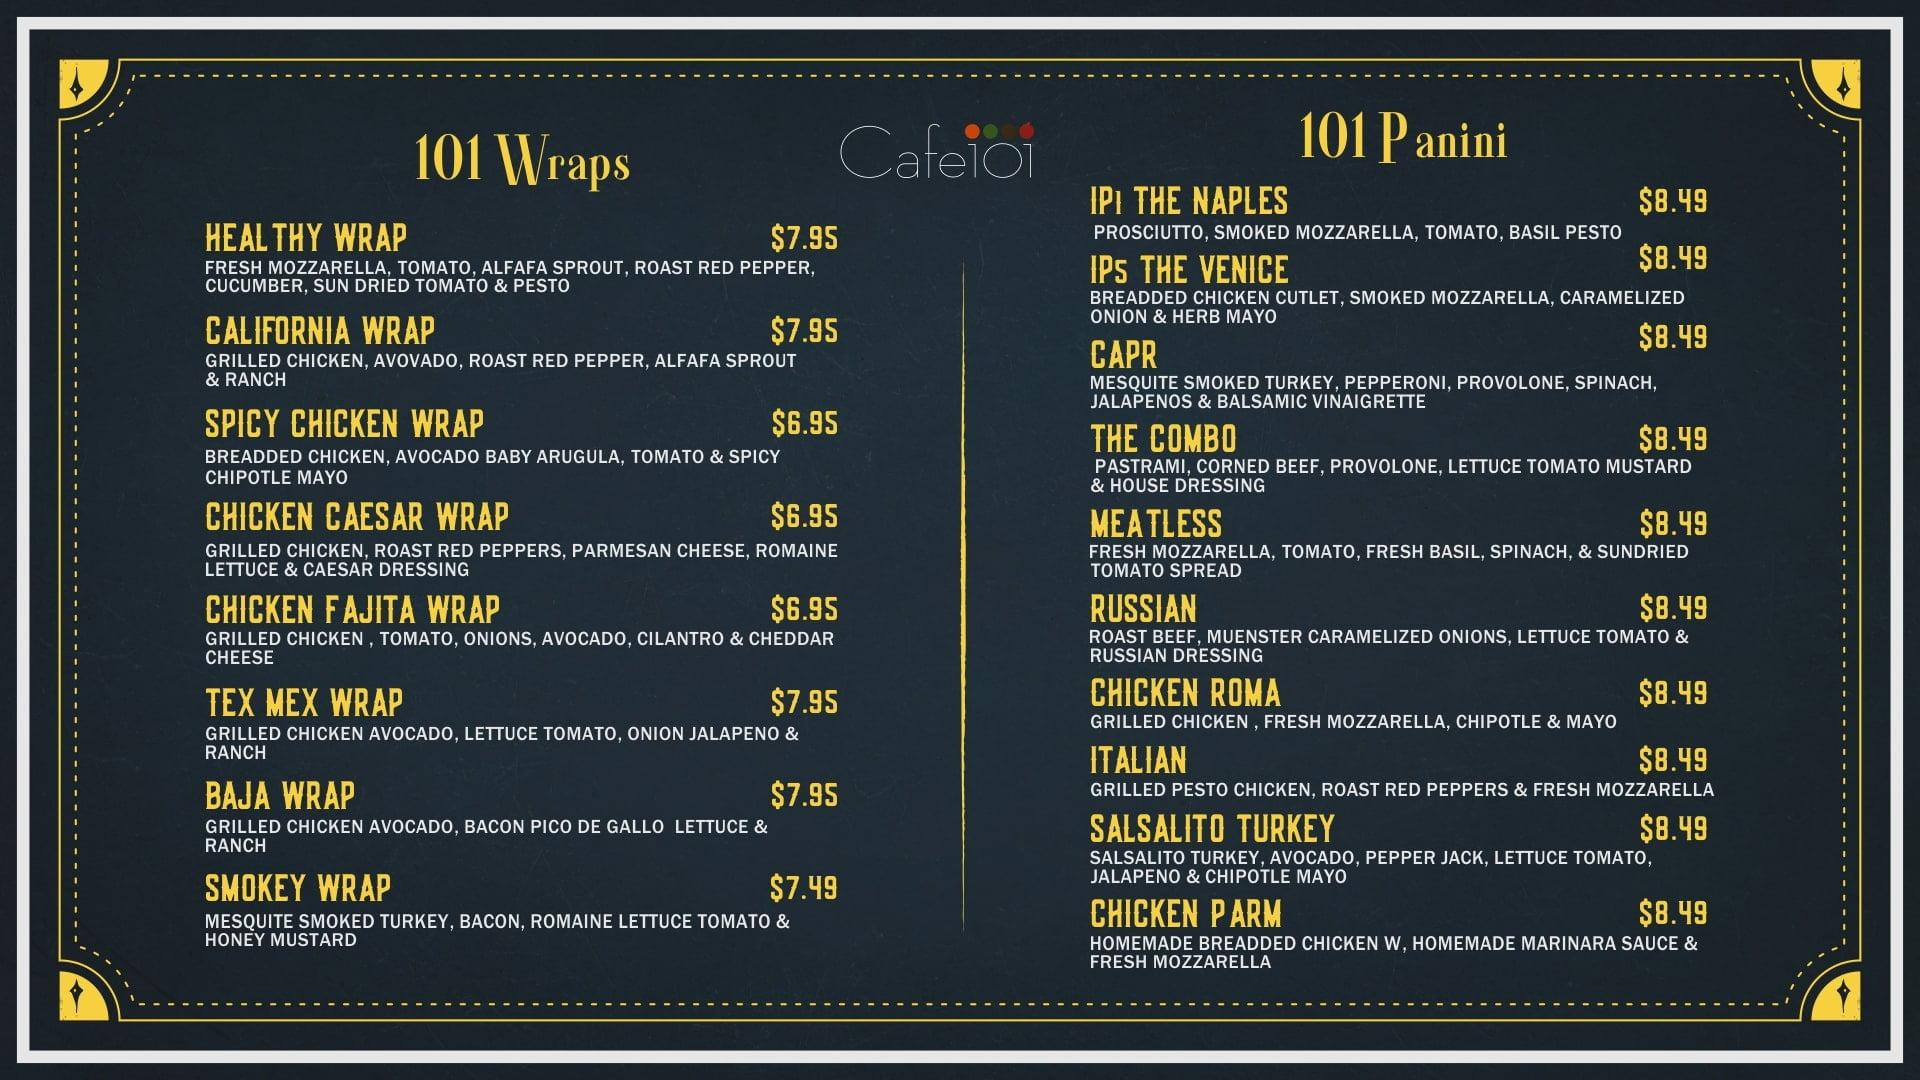 101 Wrap & Panini by GoDesign.pk